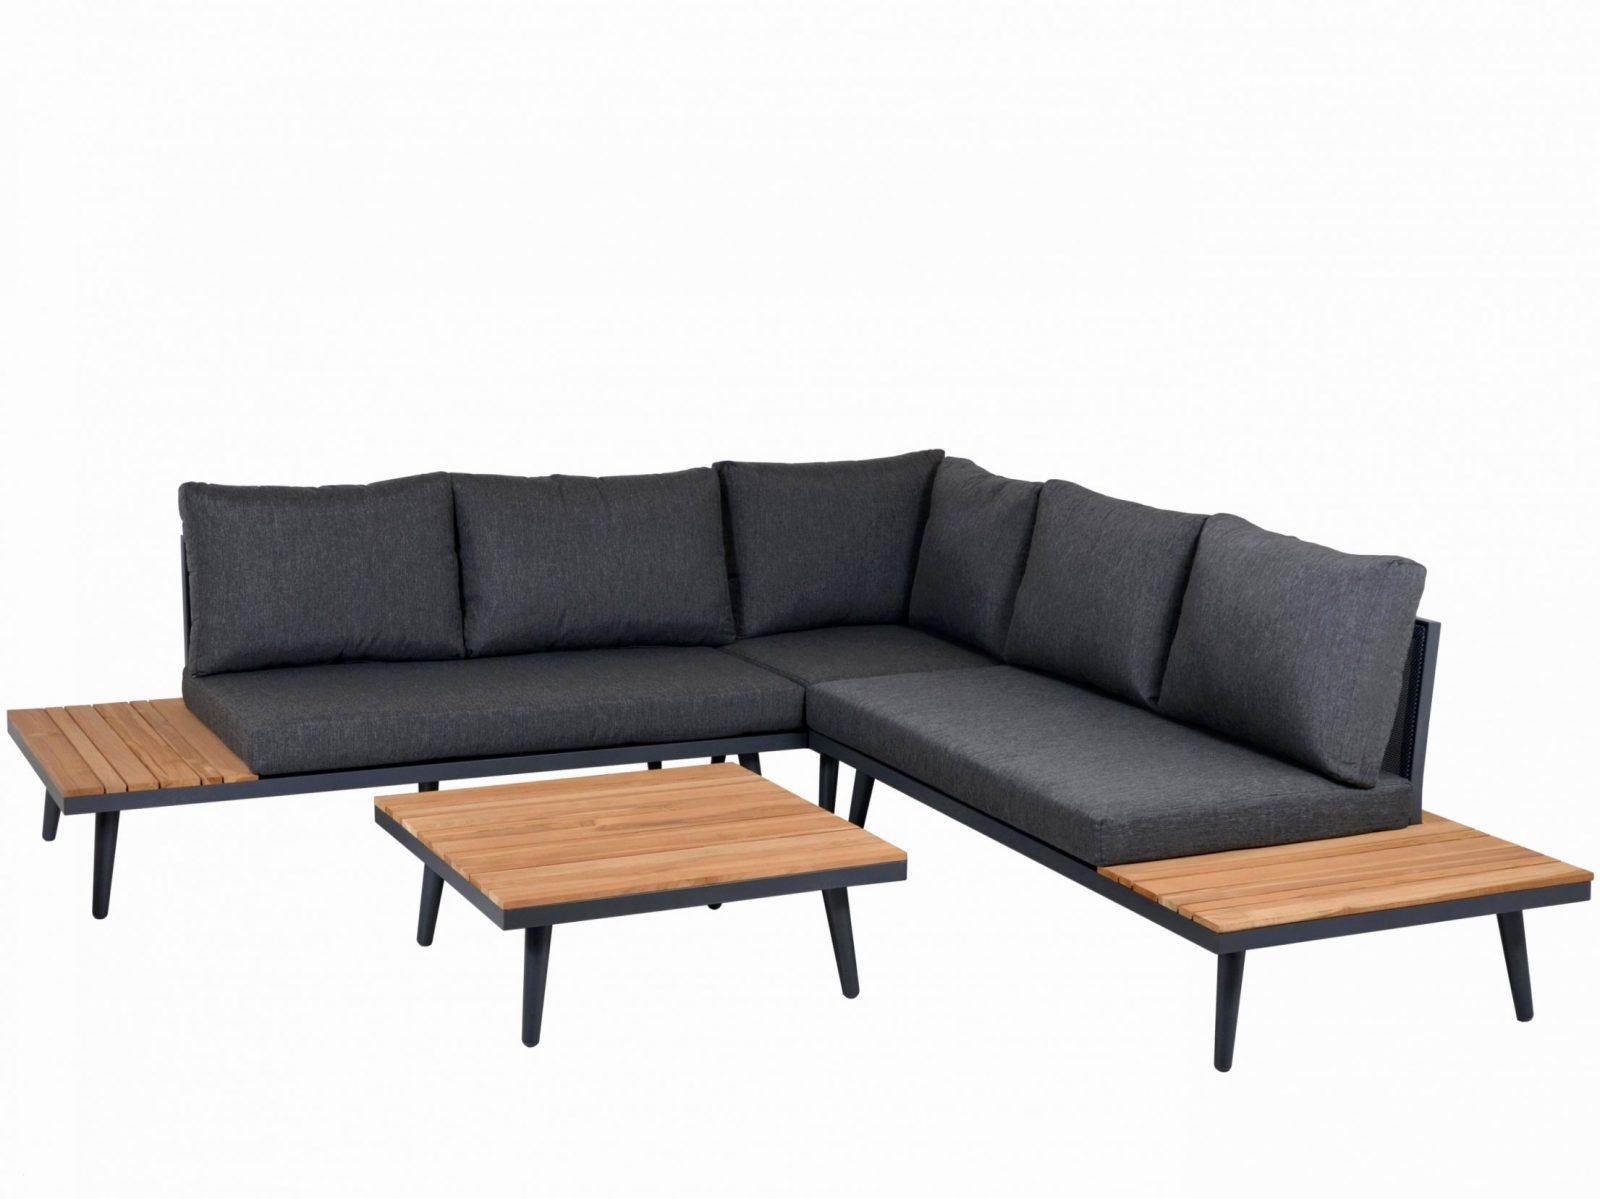 Sofa Auf Raten Kaufen Trotz Schufa